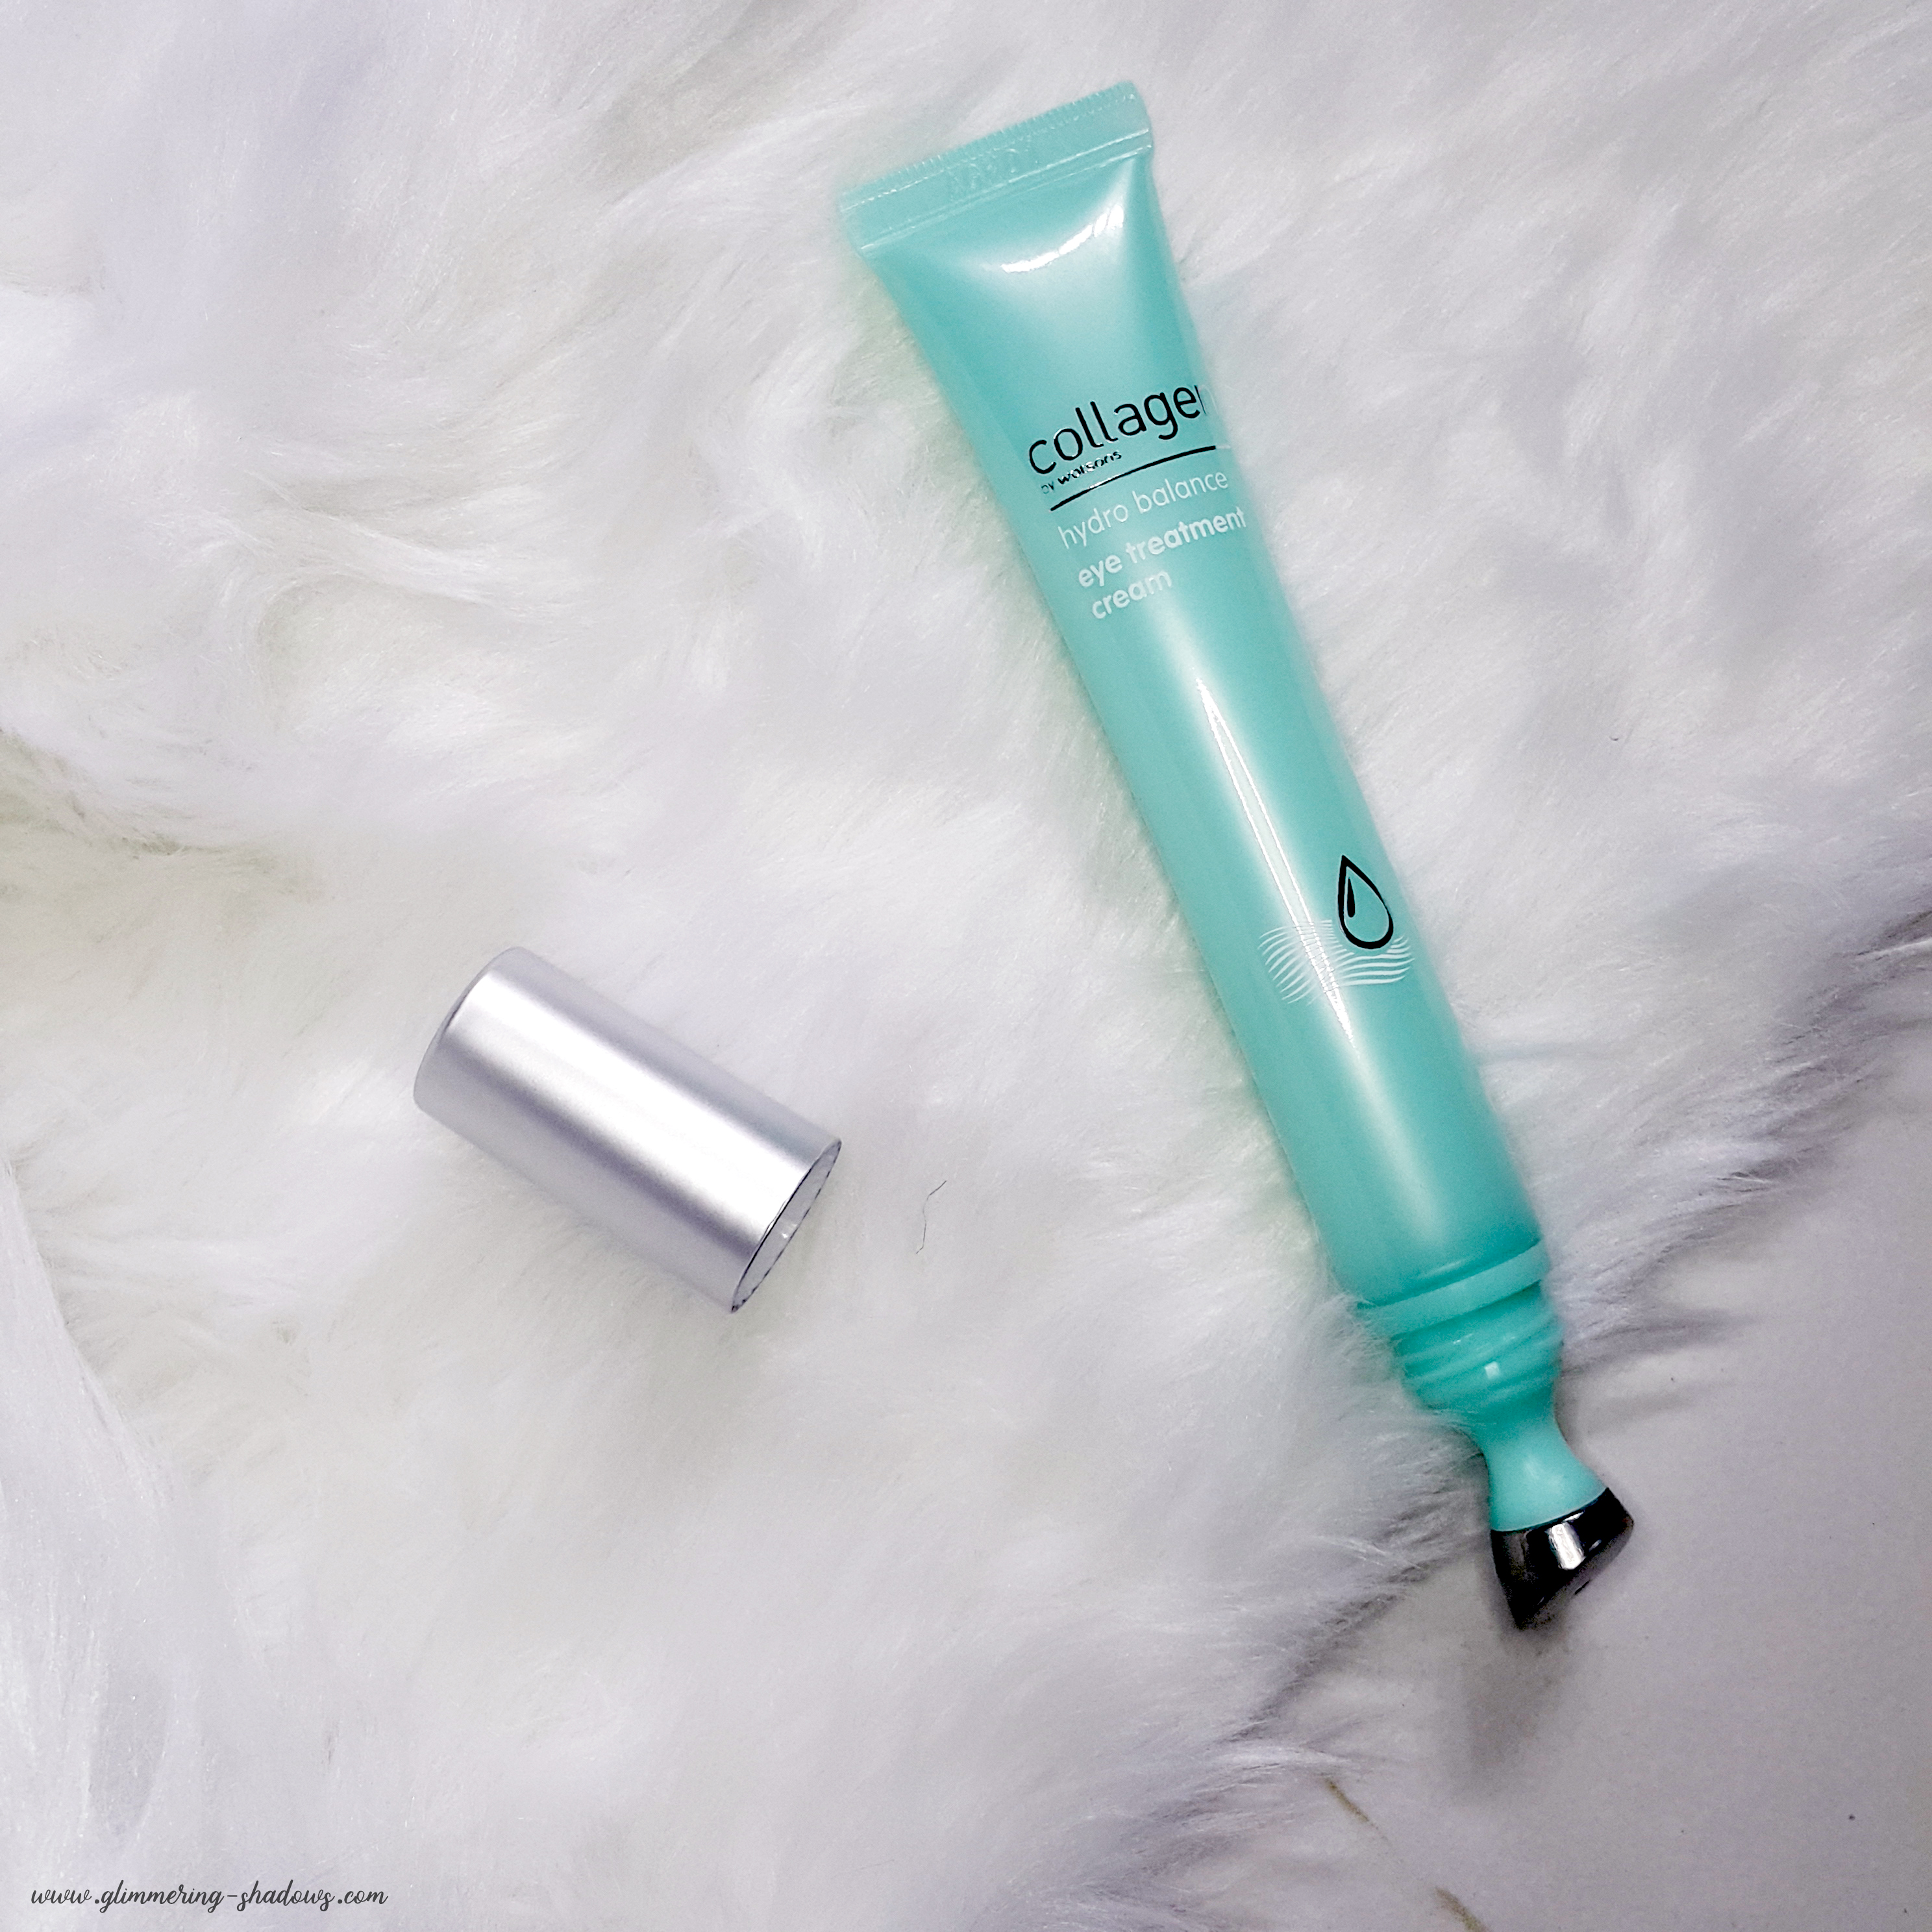 collagen by watsons hydrobalance eye treatment cream